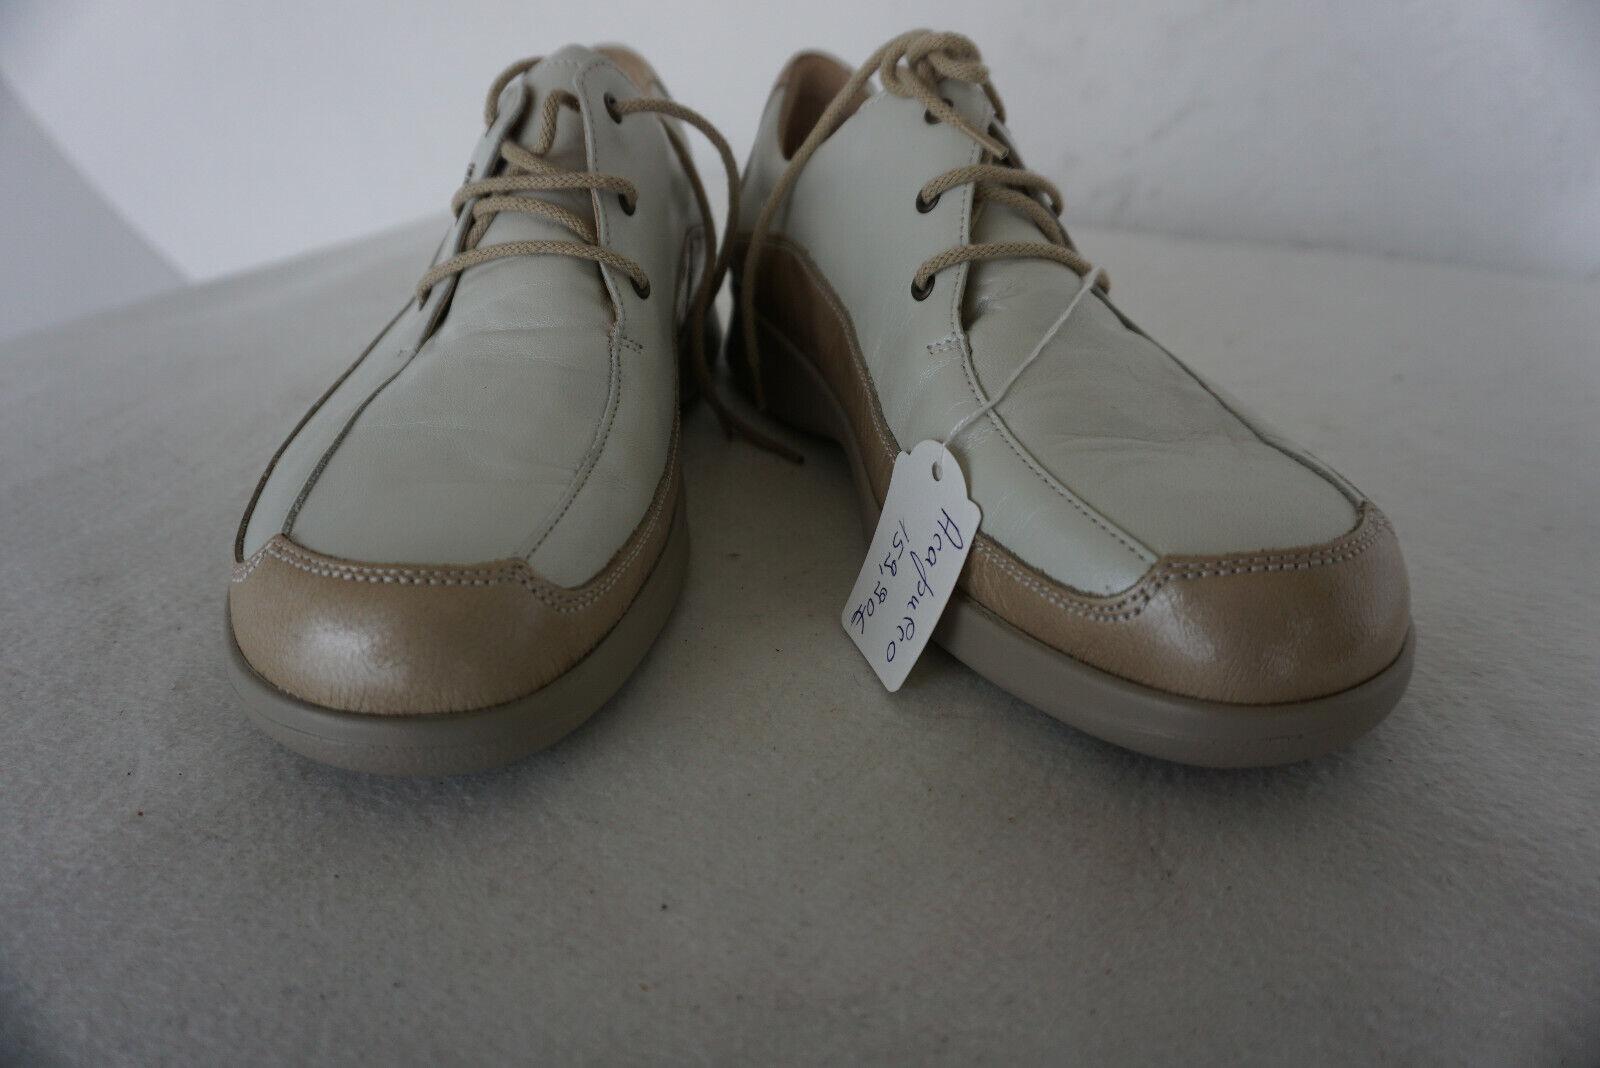 Finn Comfort ACAPULCO Chaussures Femmes Chaussure Lacée M dépôts taille 6,5 40 cuir Neuf